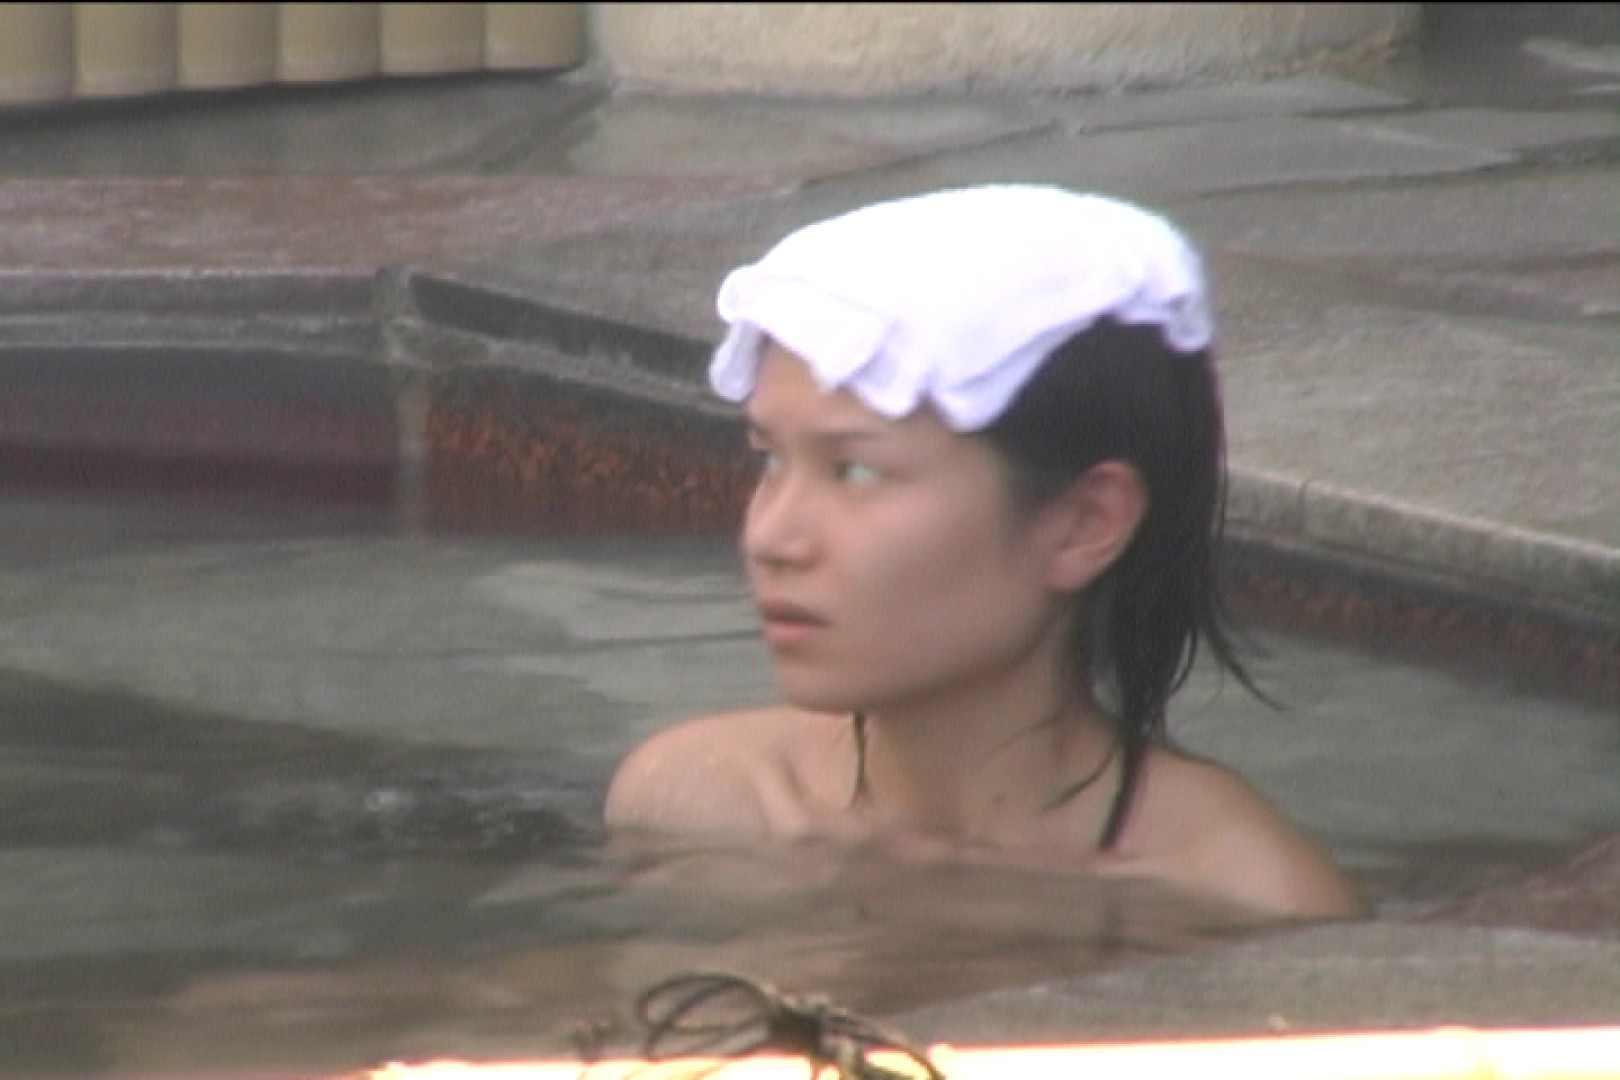 Aquaな露天風呂Vol.530 盗撮 | HなOL  88pic 2